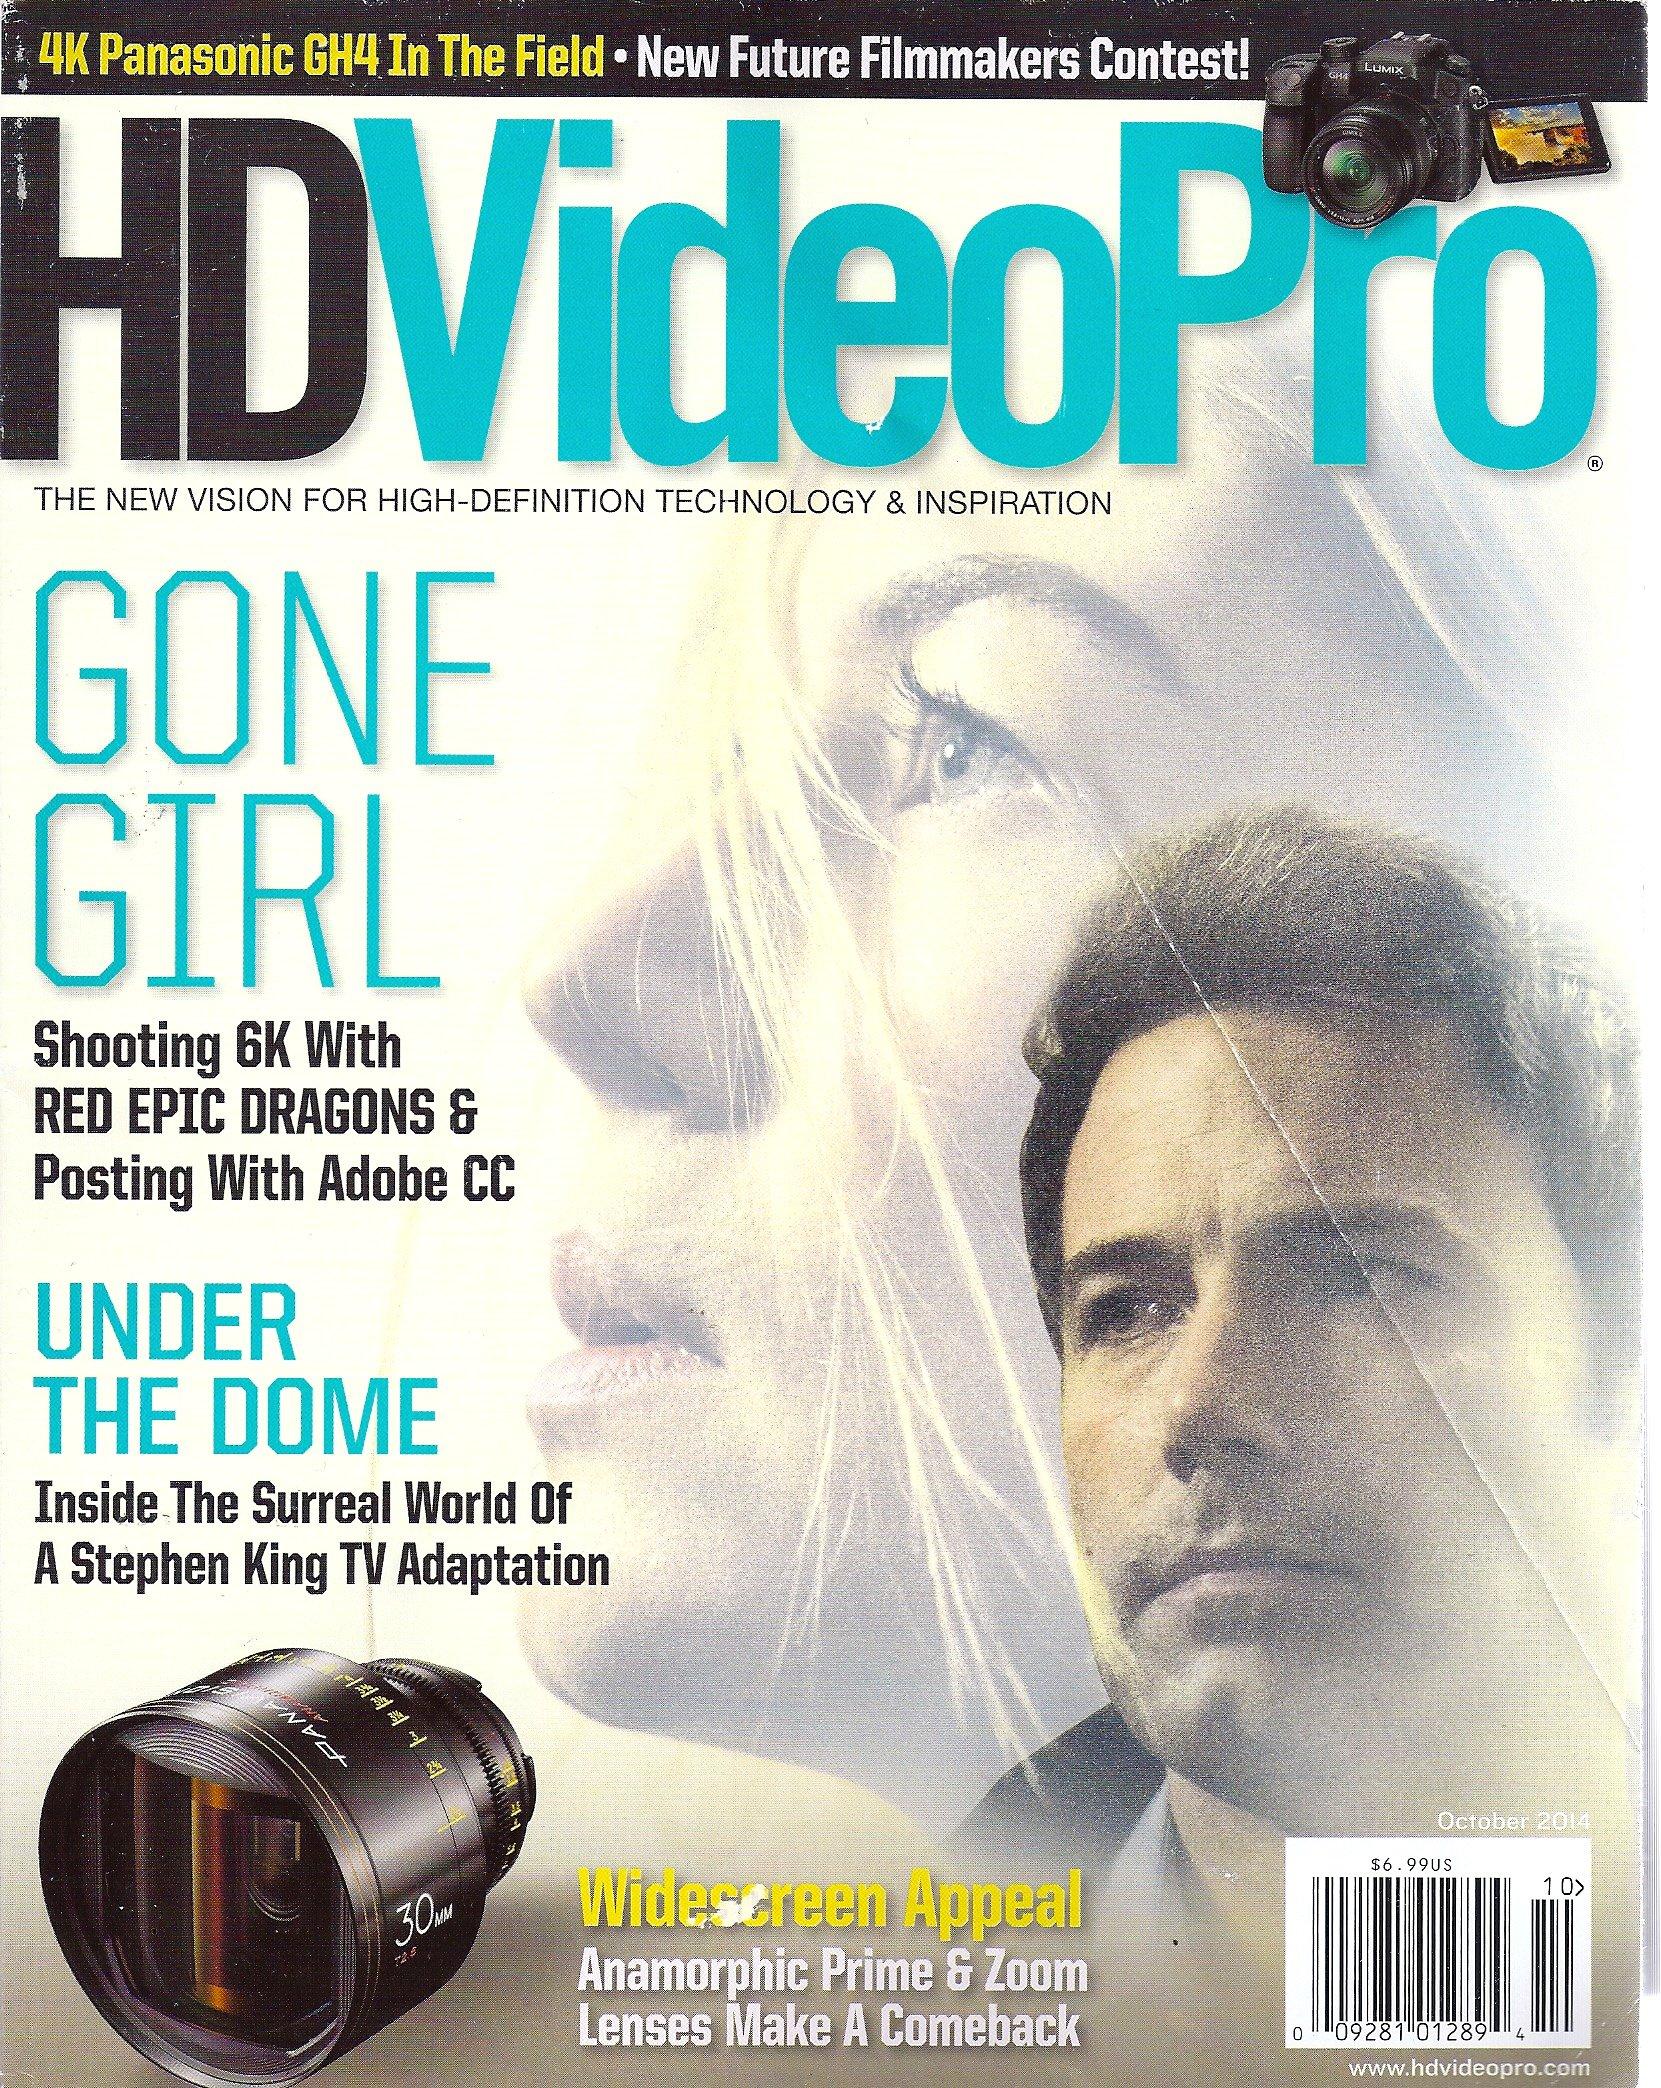 Rosamund Pike & Ben Affleck (Gone Girl) * Stephen King (Under the Dome) * November, 2014 HD Video Pro Magazine PDF